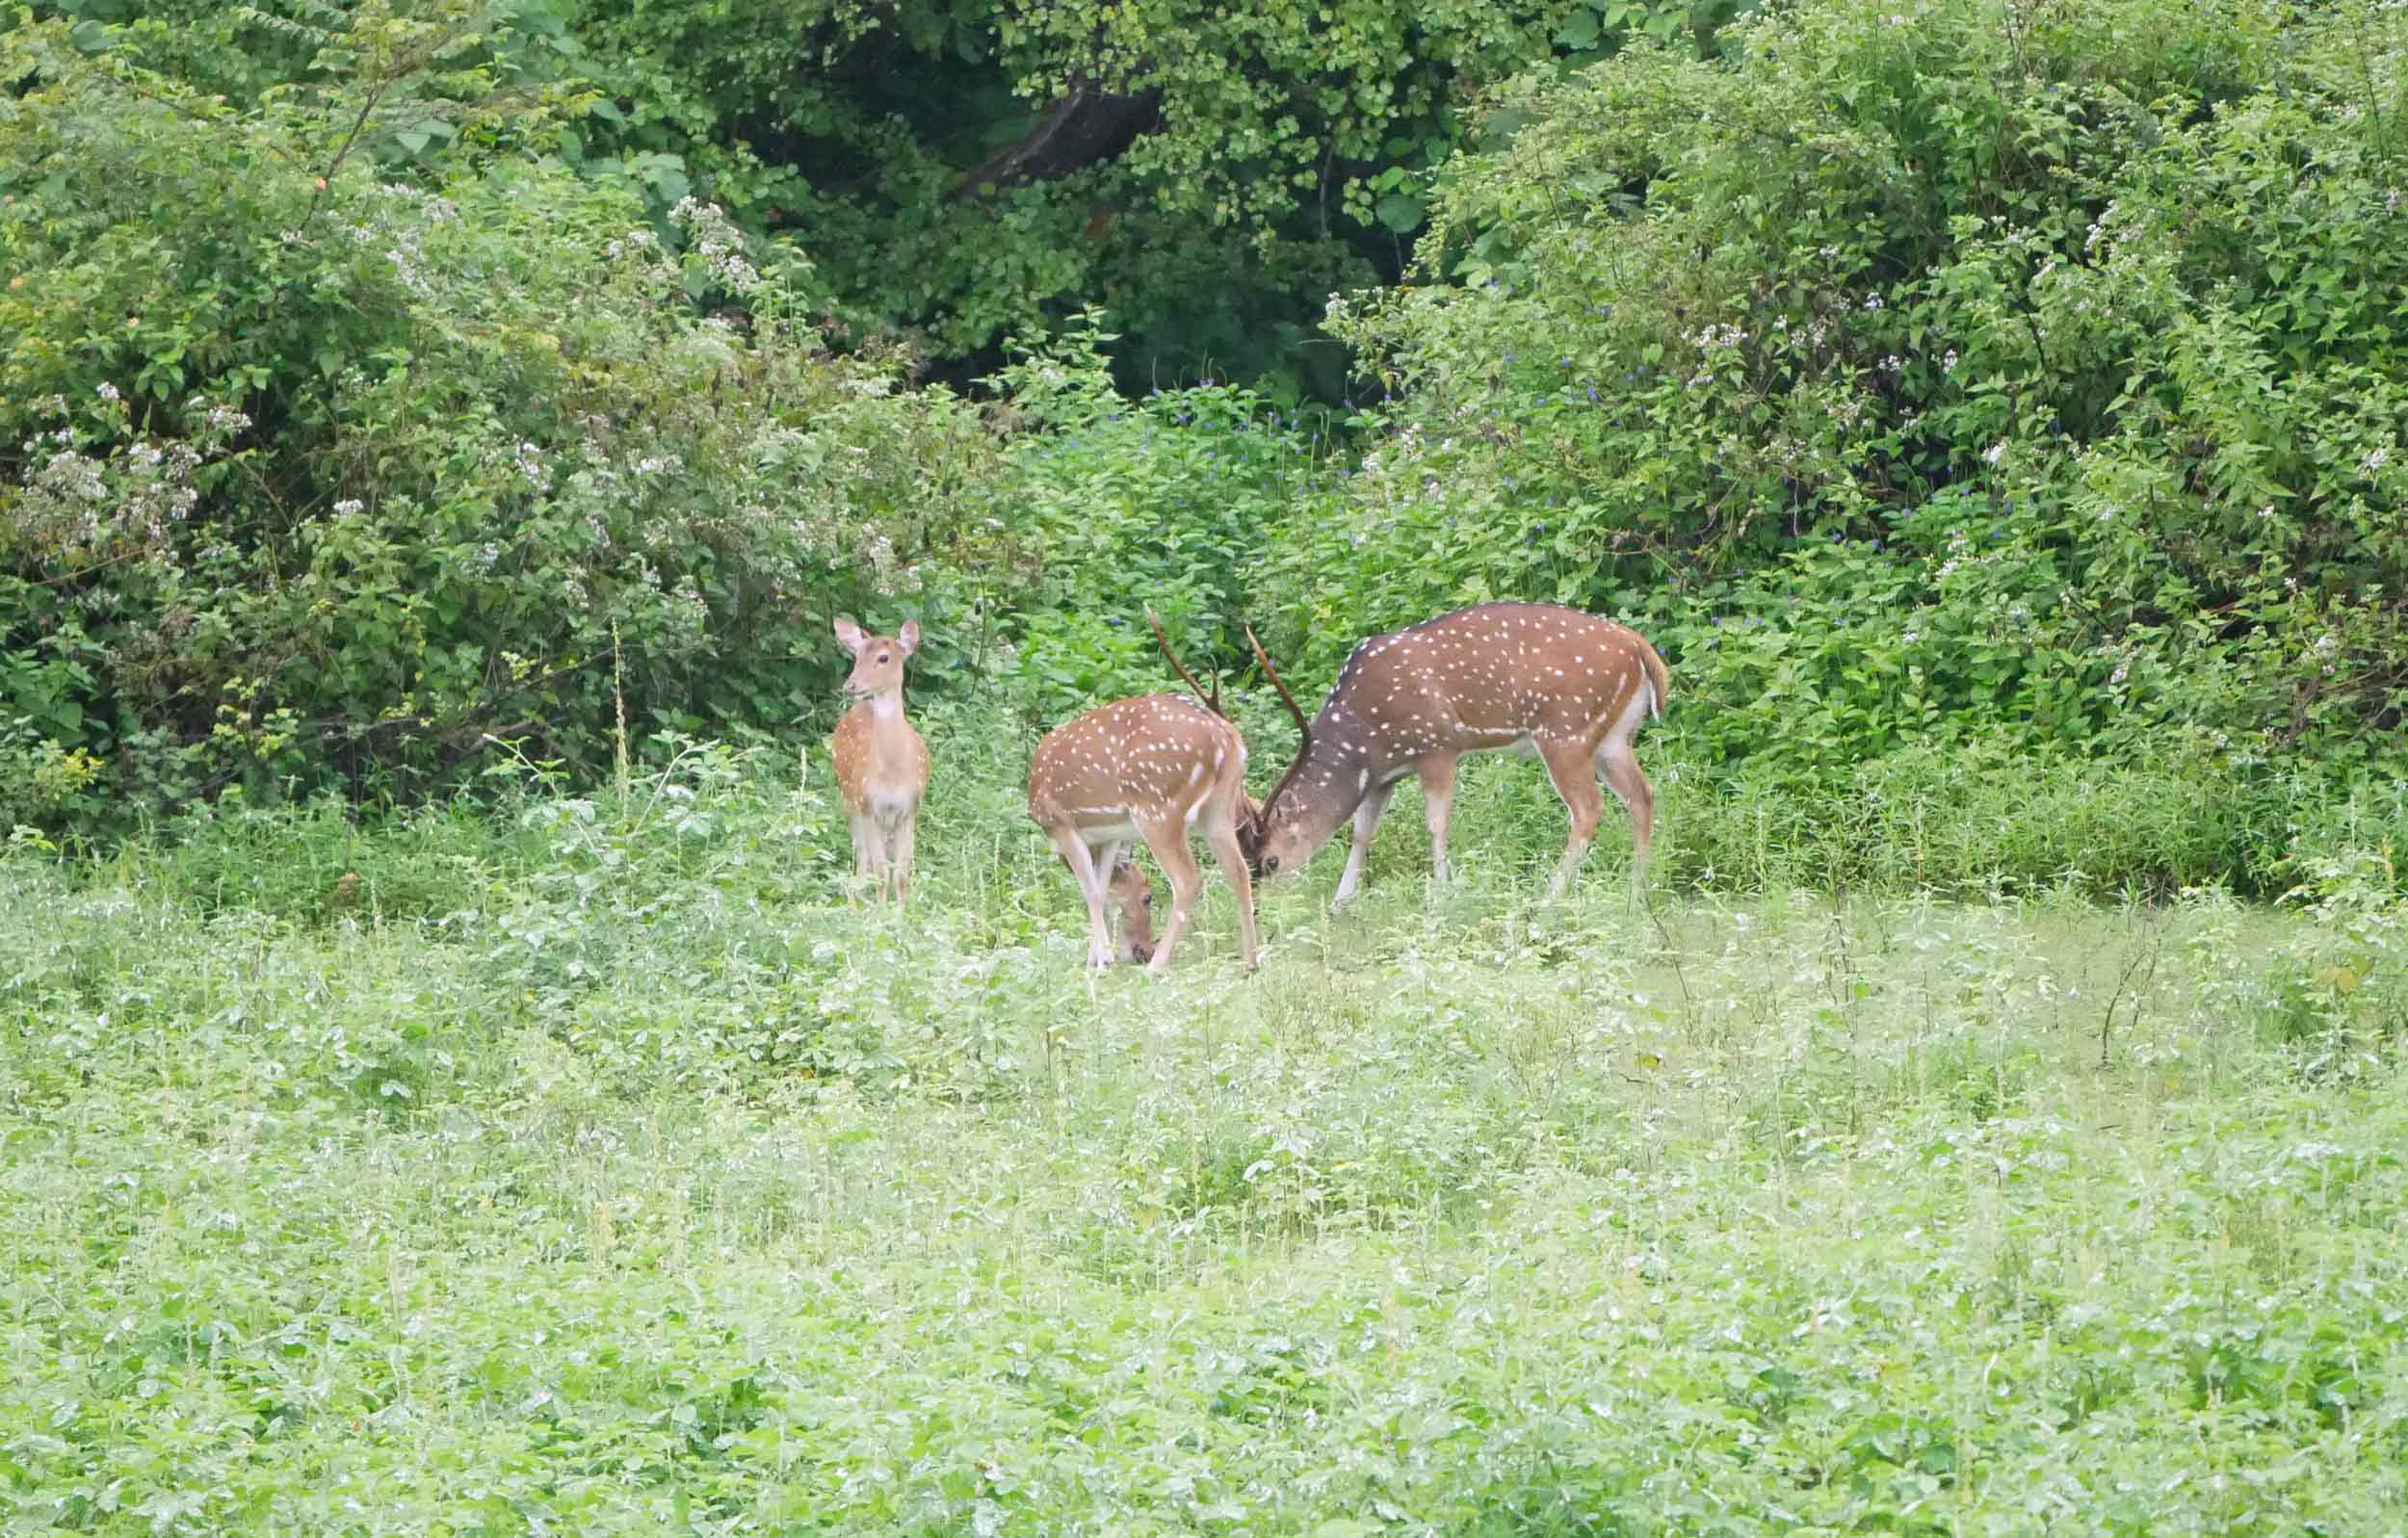 A small herd of Sri Lankan Sambar Deer grazed in a meadow.